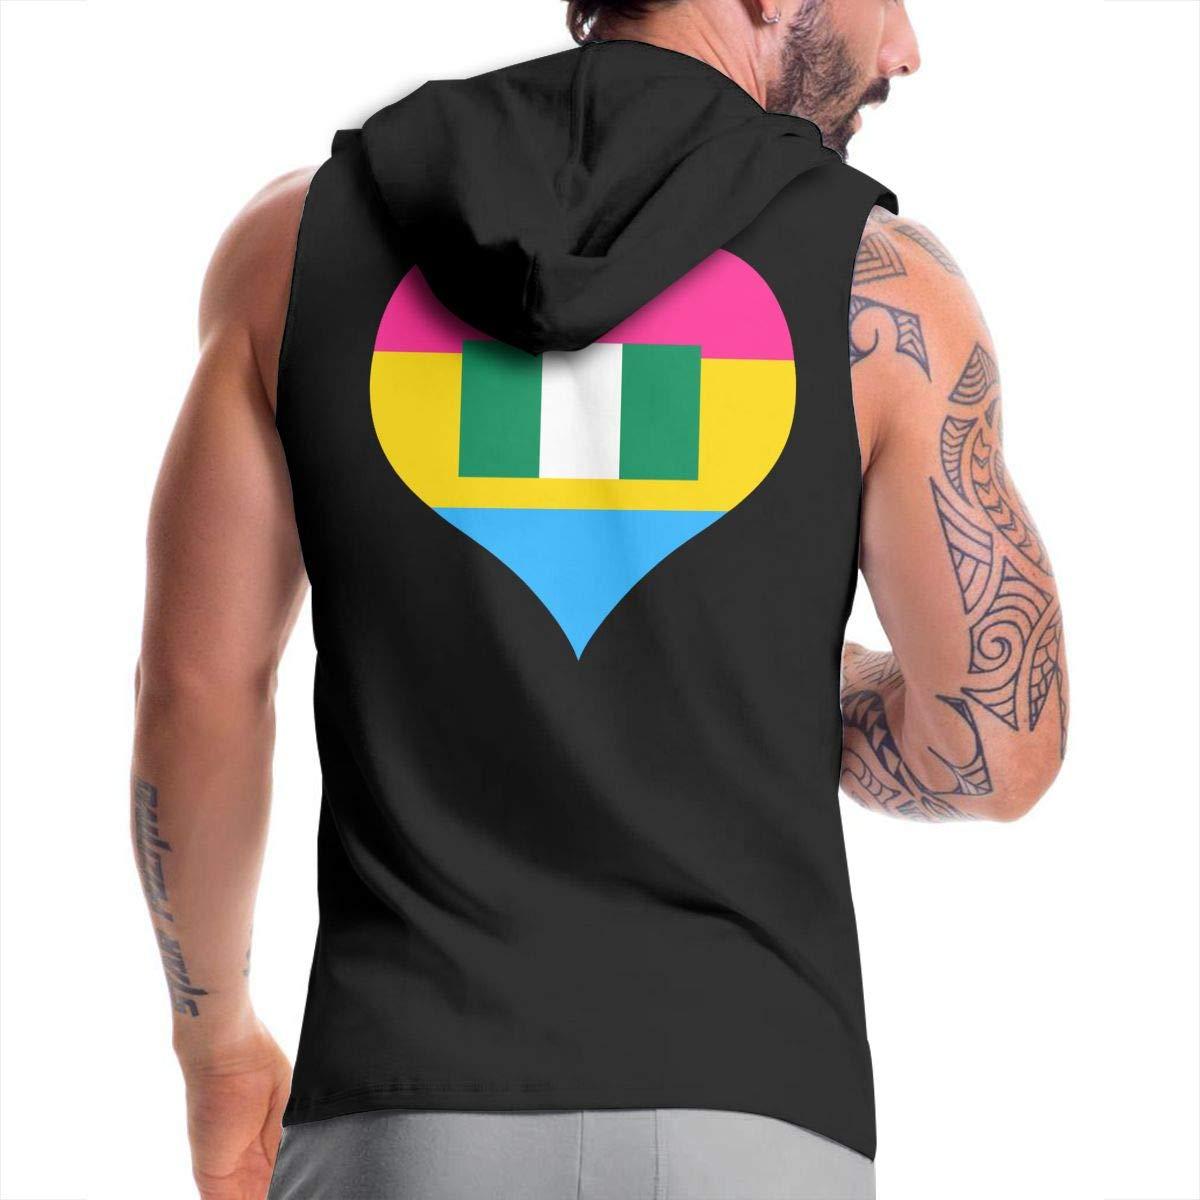 BMWEITIHBQ Mens Sleeveless Sweatshirt Pansexual Heart Nigerian Flag Zipper Tank Tops